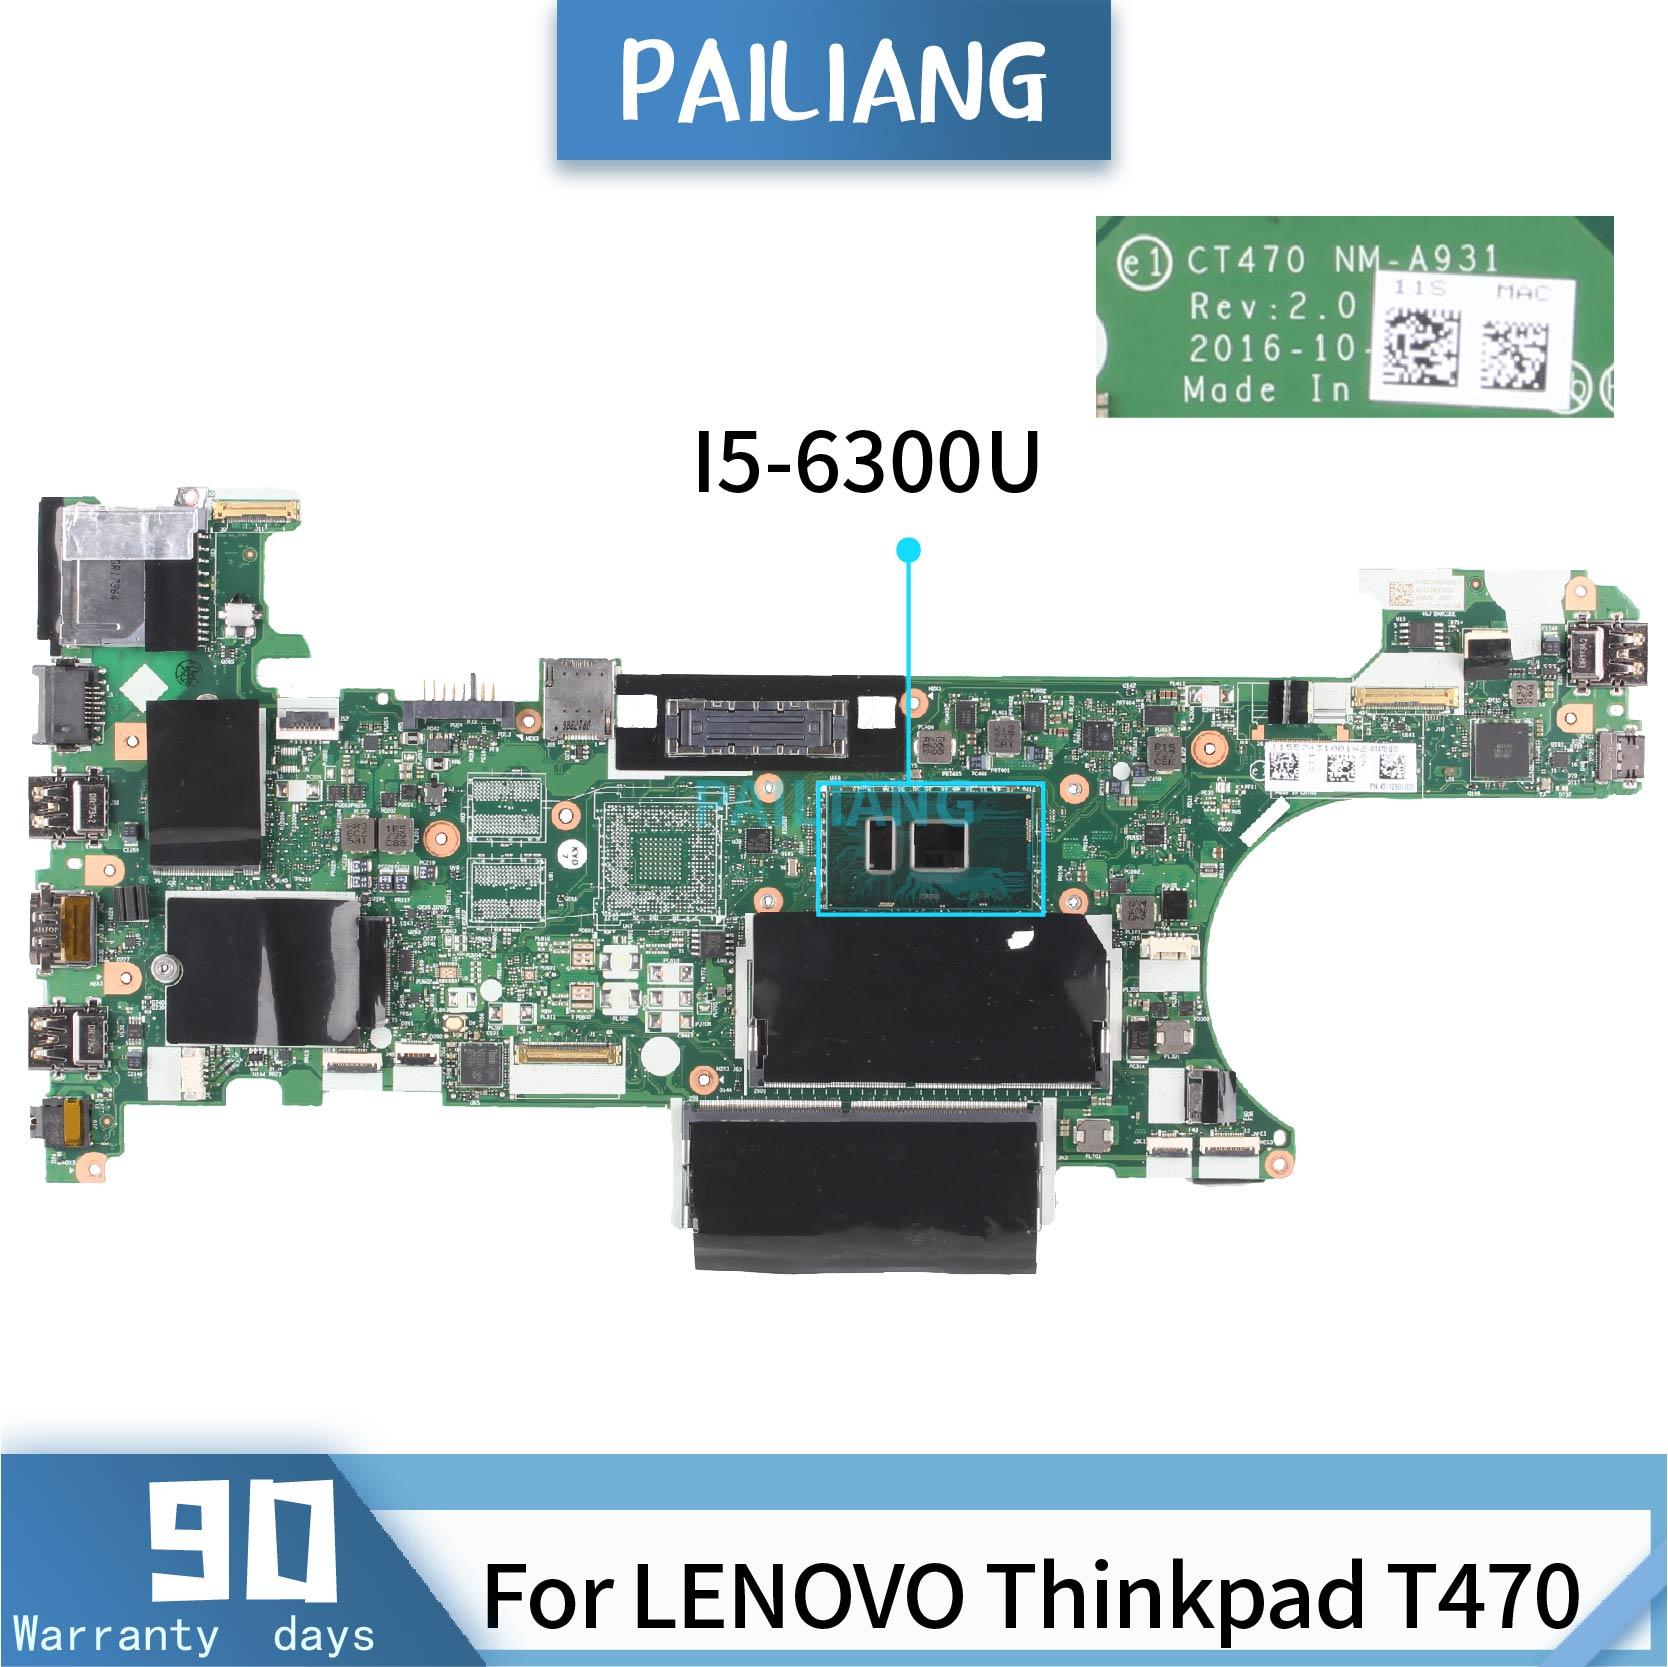 Placa base para portátil PAILIANG para LENOVO Thinkpad T470 NM-A931 placa base Core SR2F0 I5-6300U probado DDR3